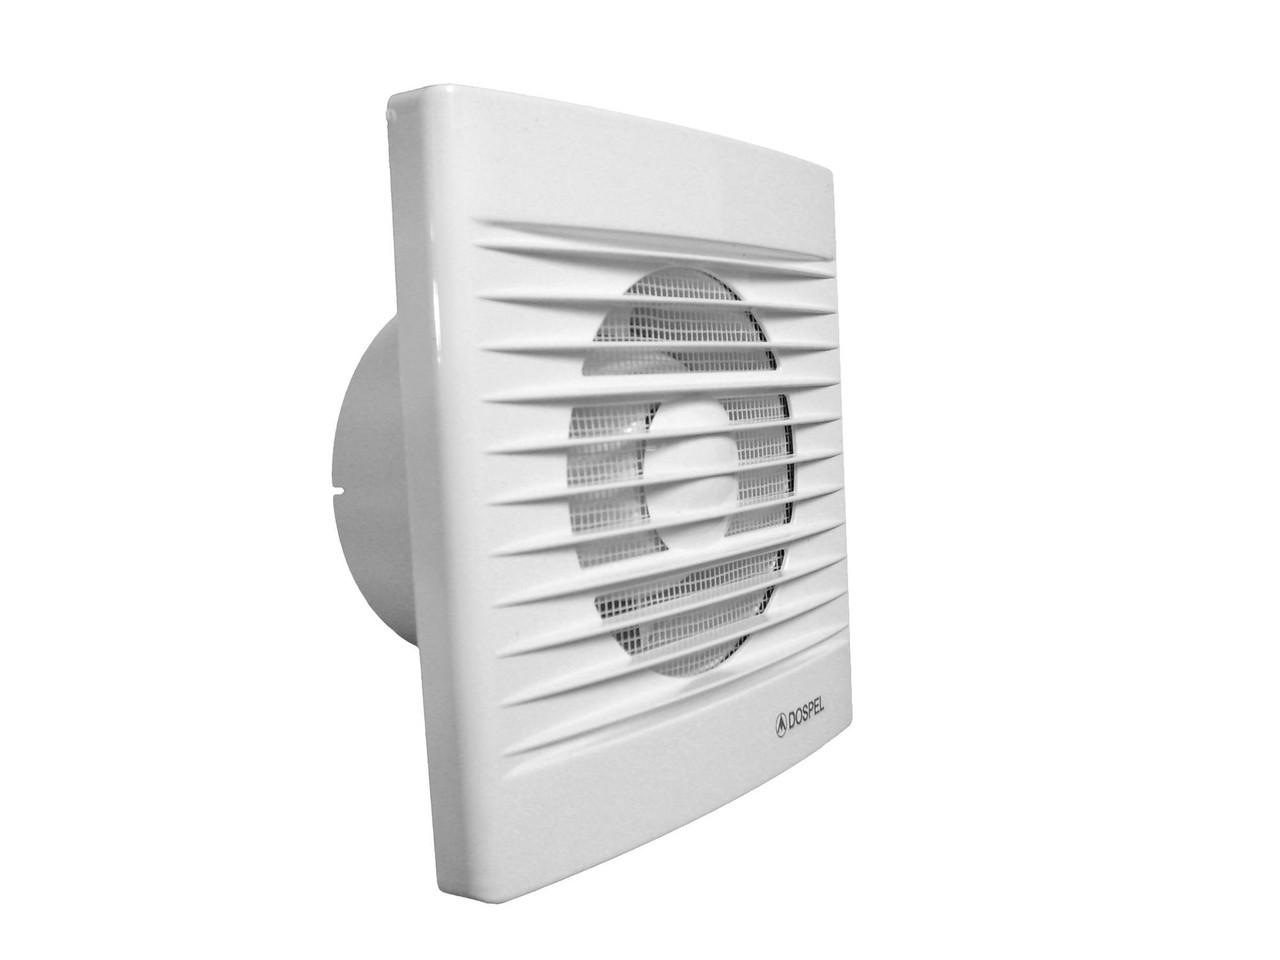 Вентилятор побутовий із зворотним клапаном Dospel STYL 100S-P (007-0001P)